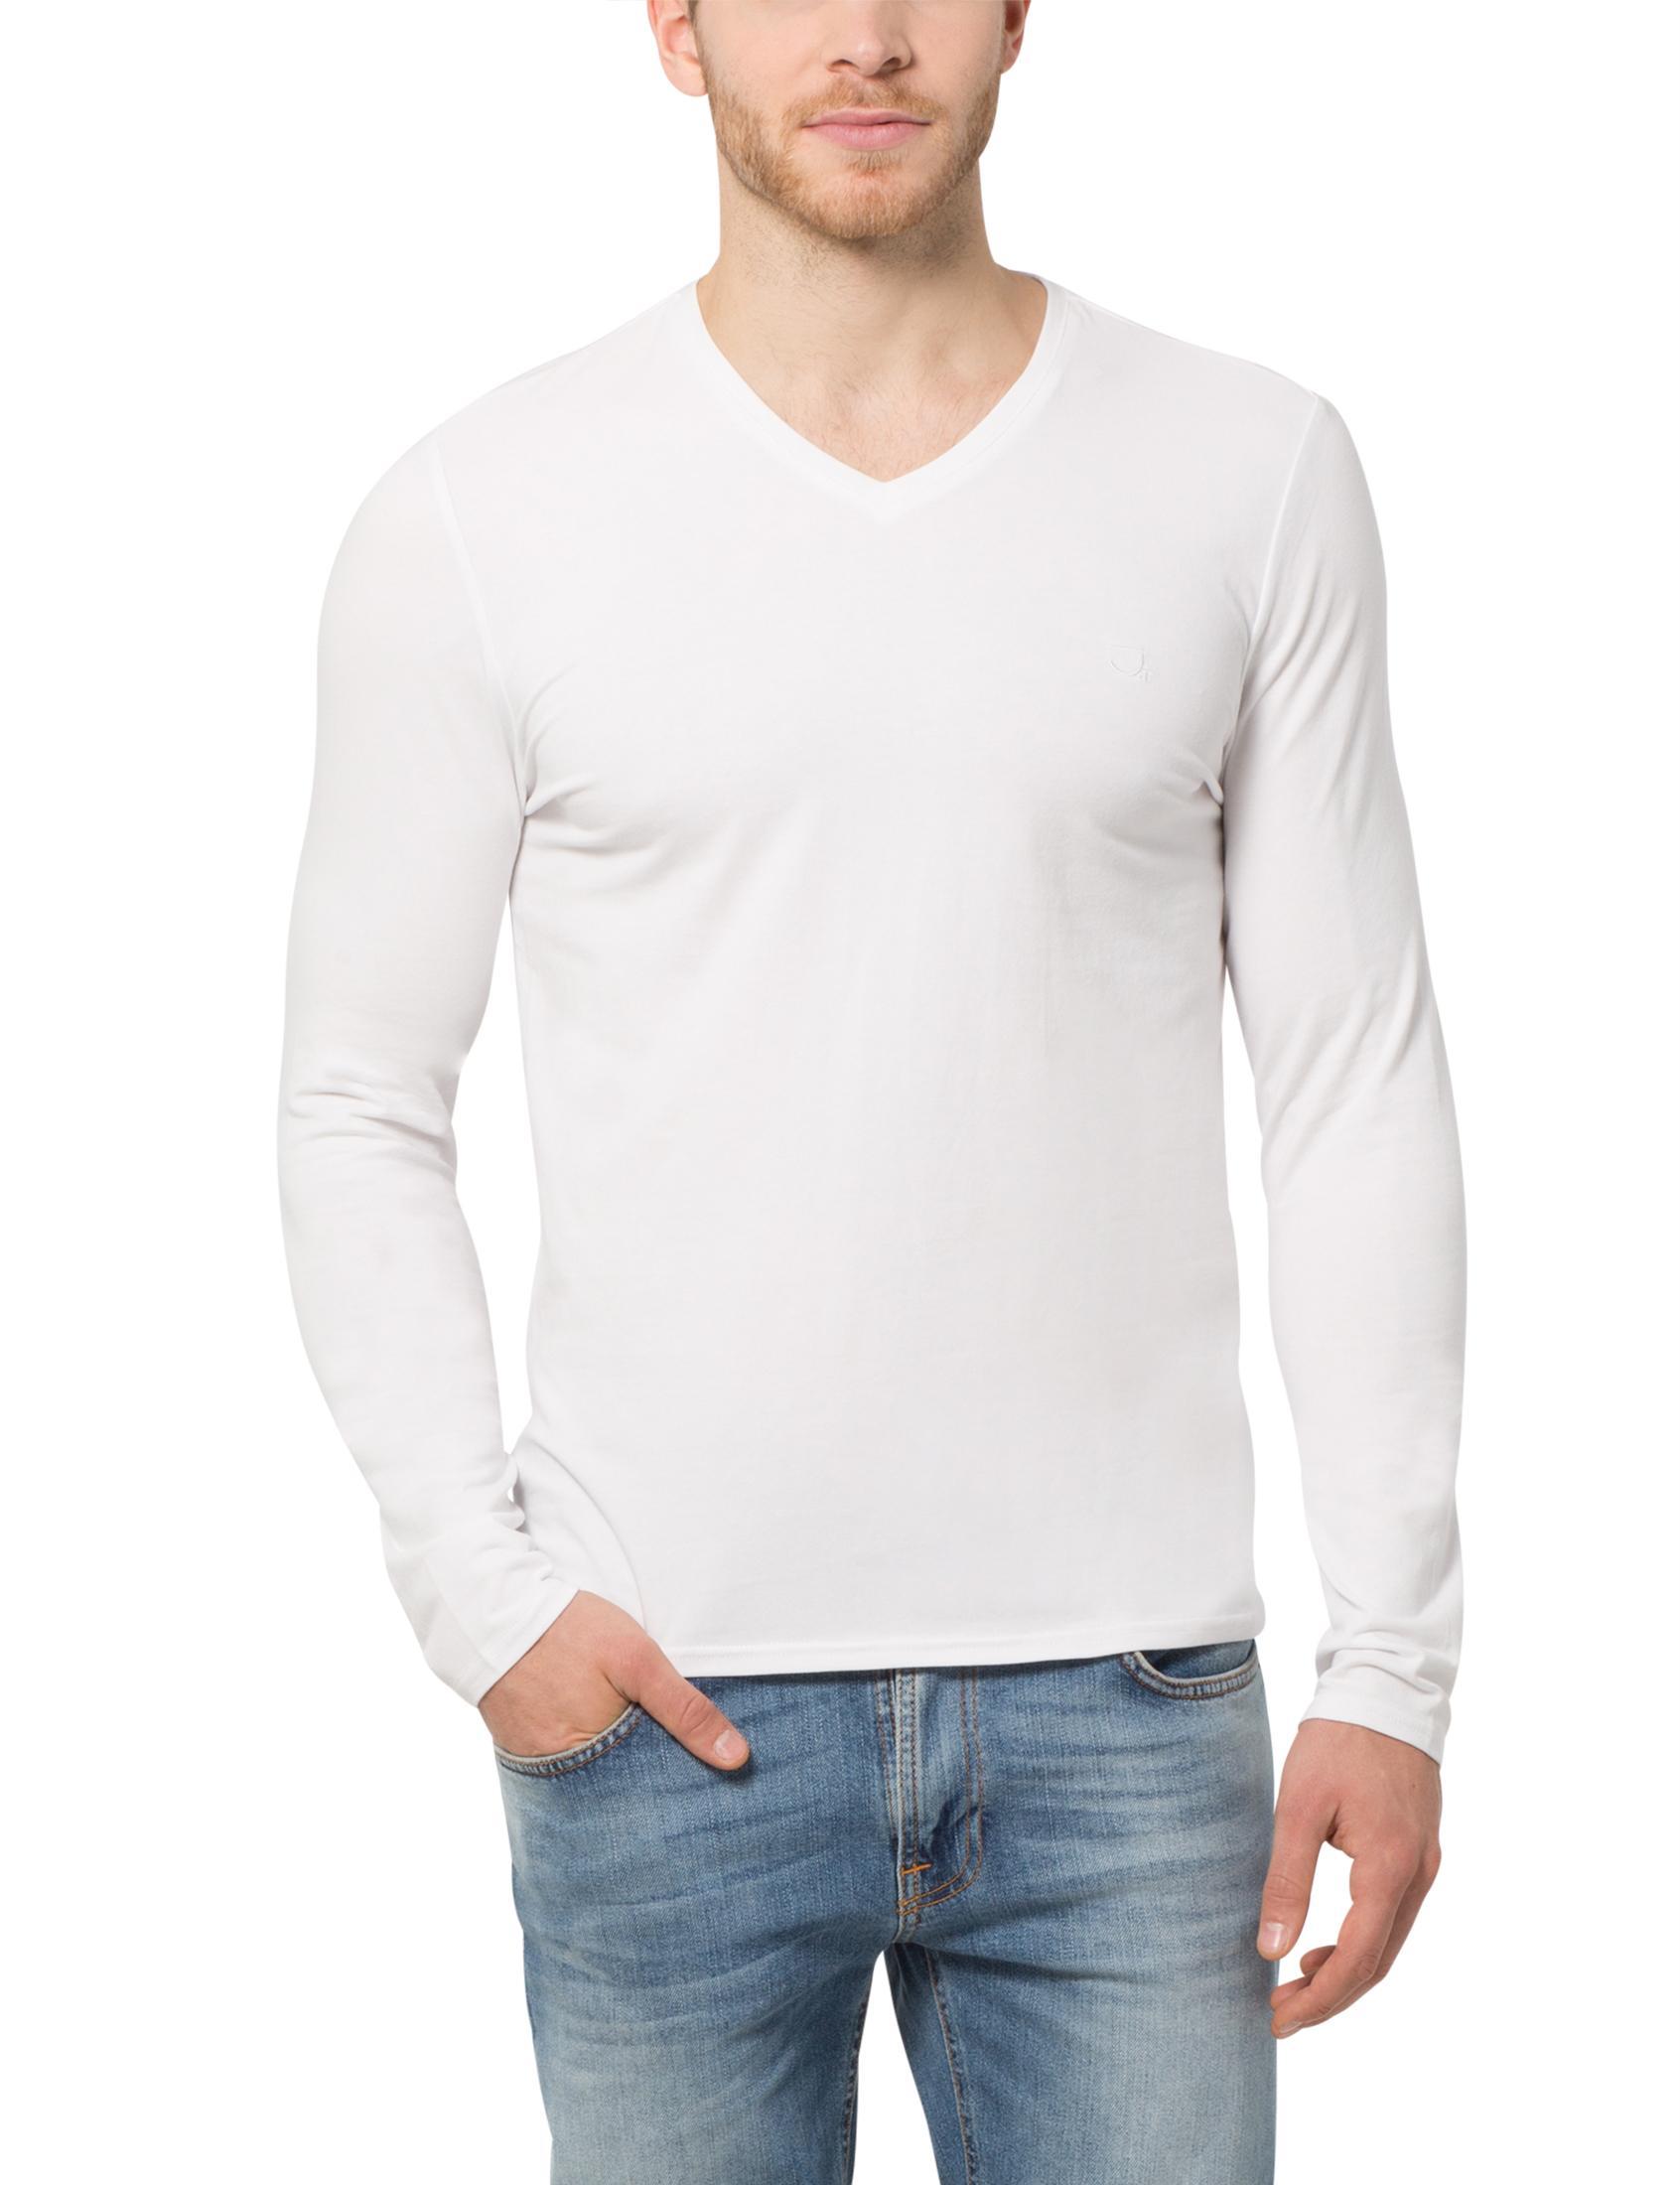 james tyler herren langarmshirt mit v ausschnitt amazon. Black Bedroom Furniture Sets. Home Design Ideas